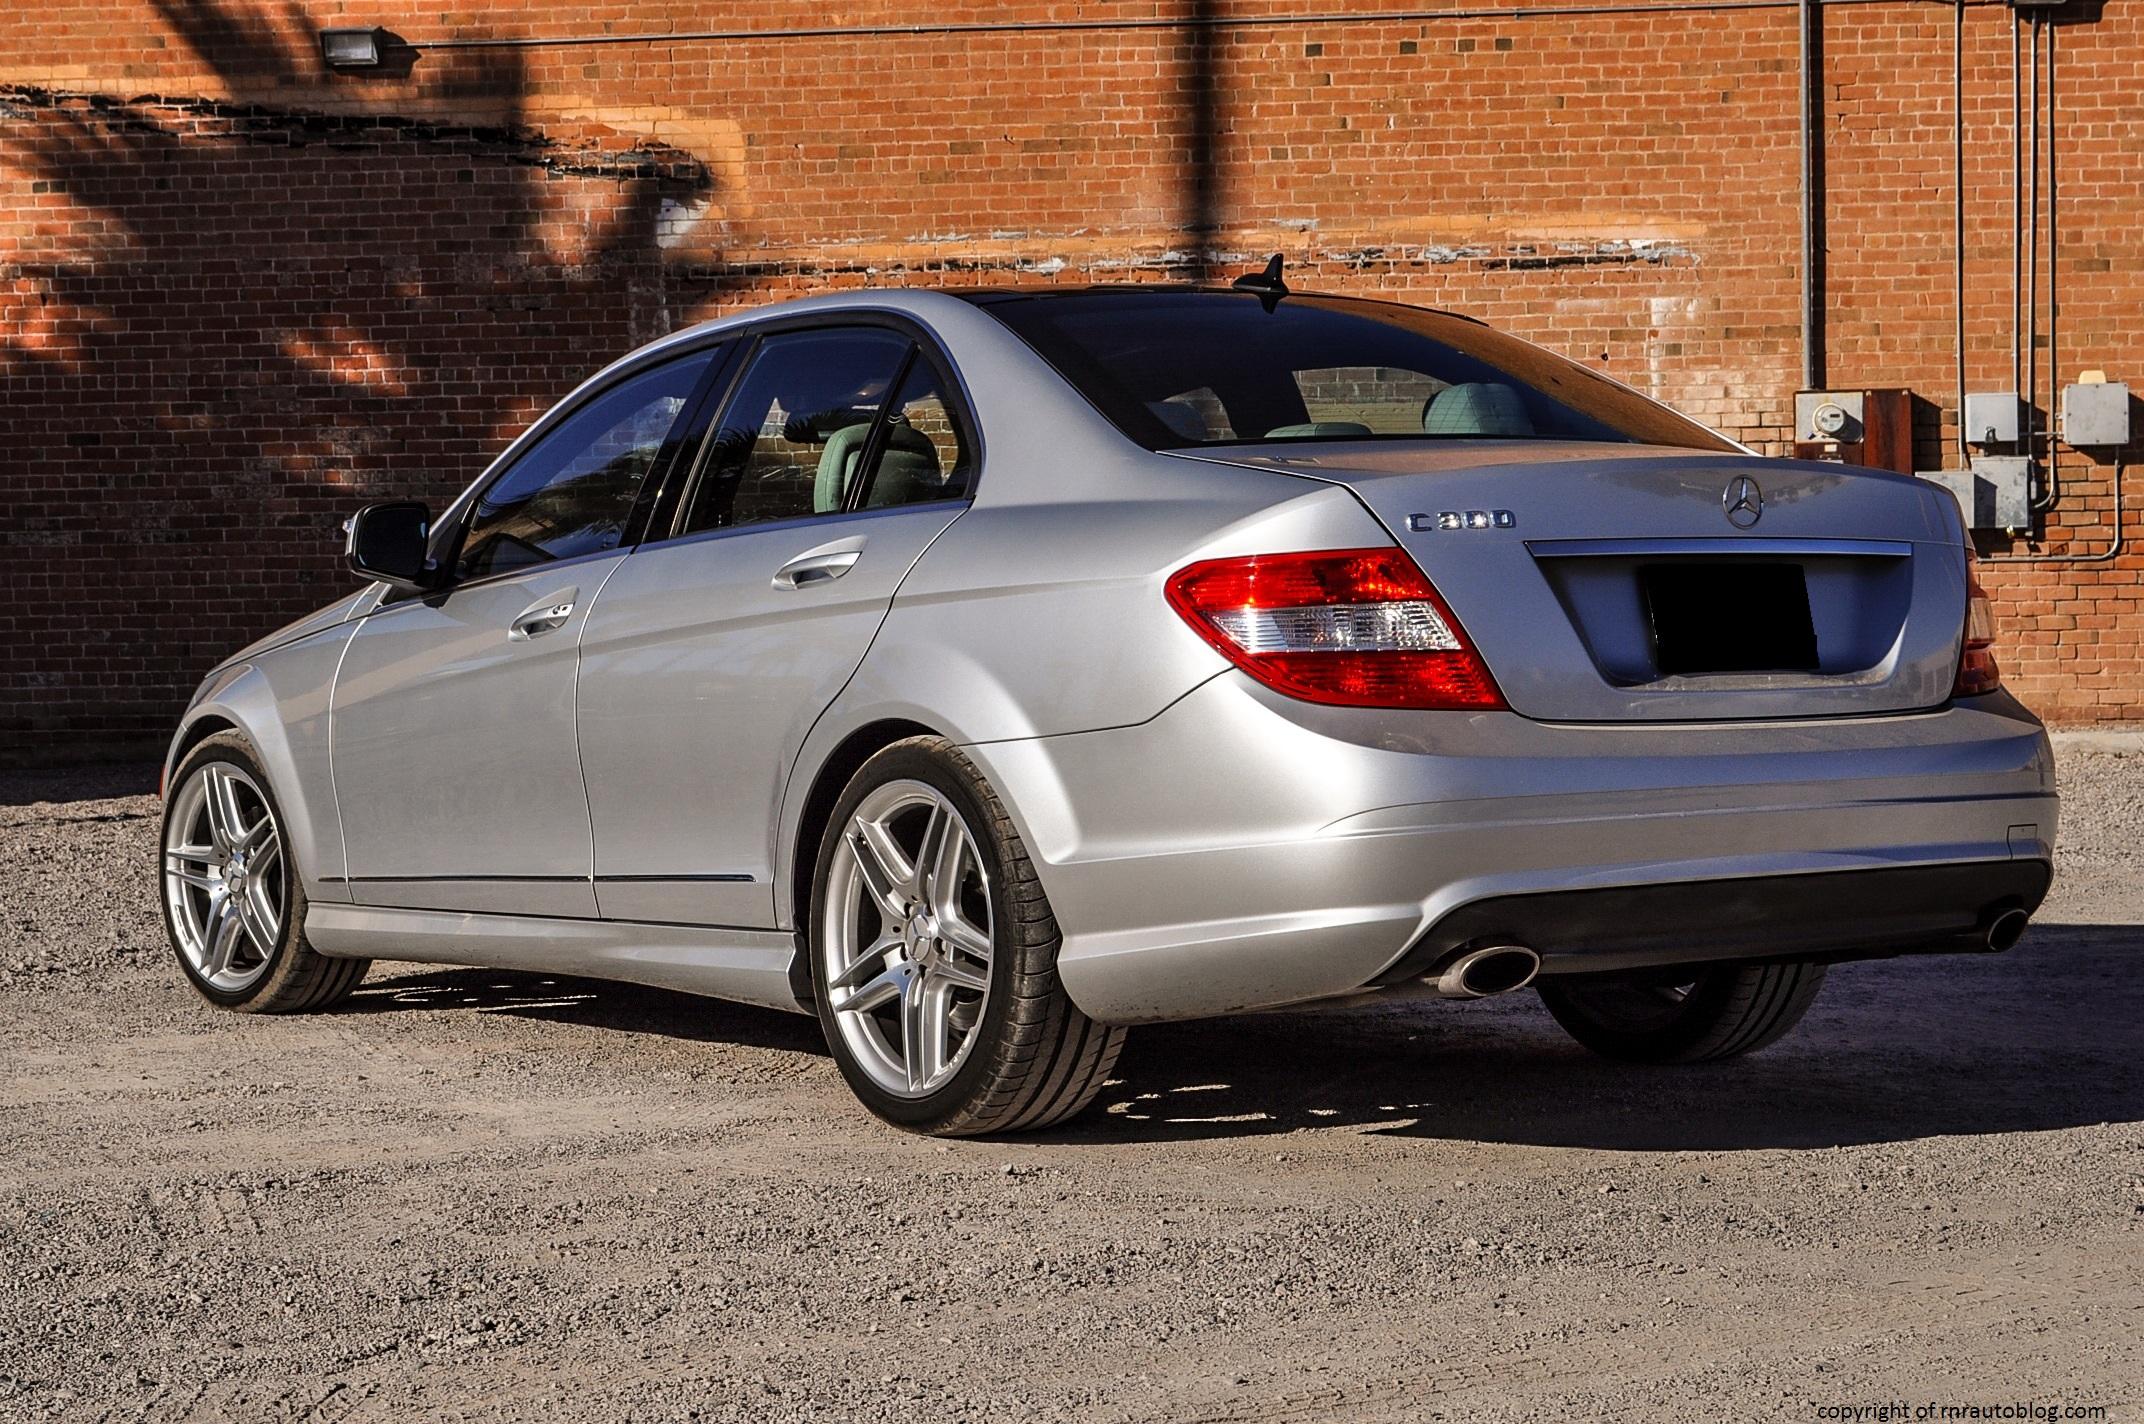 2009 Mercedes-Benz C300 Sport Photoshoot | RNR Automotive Blog